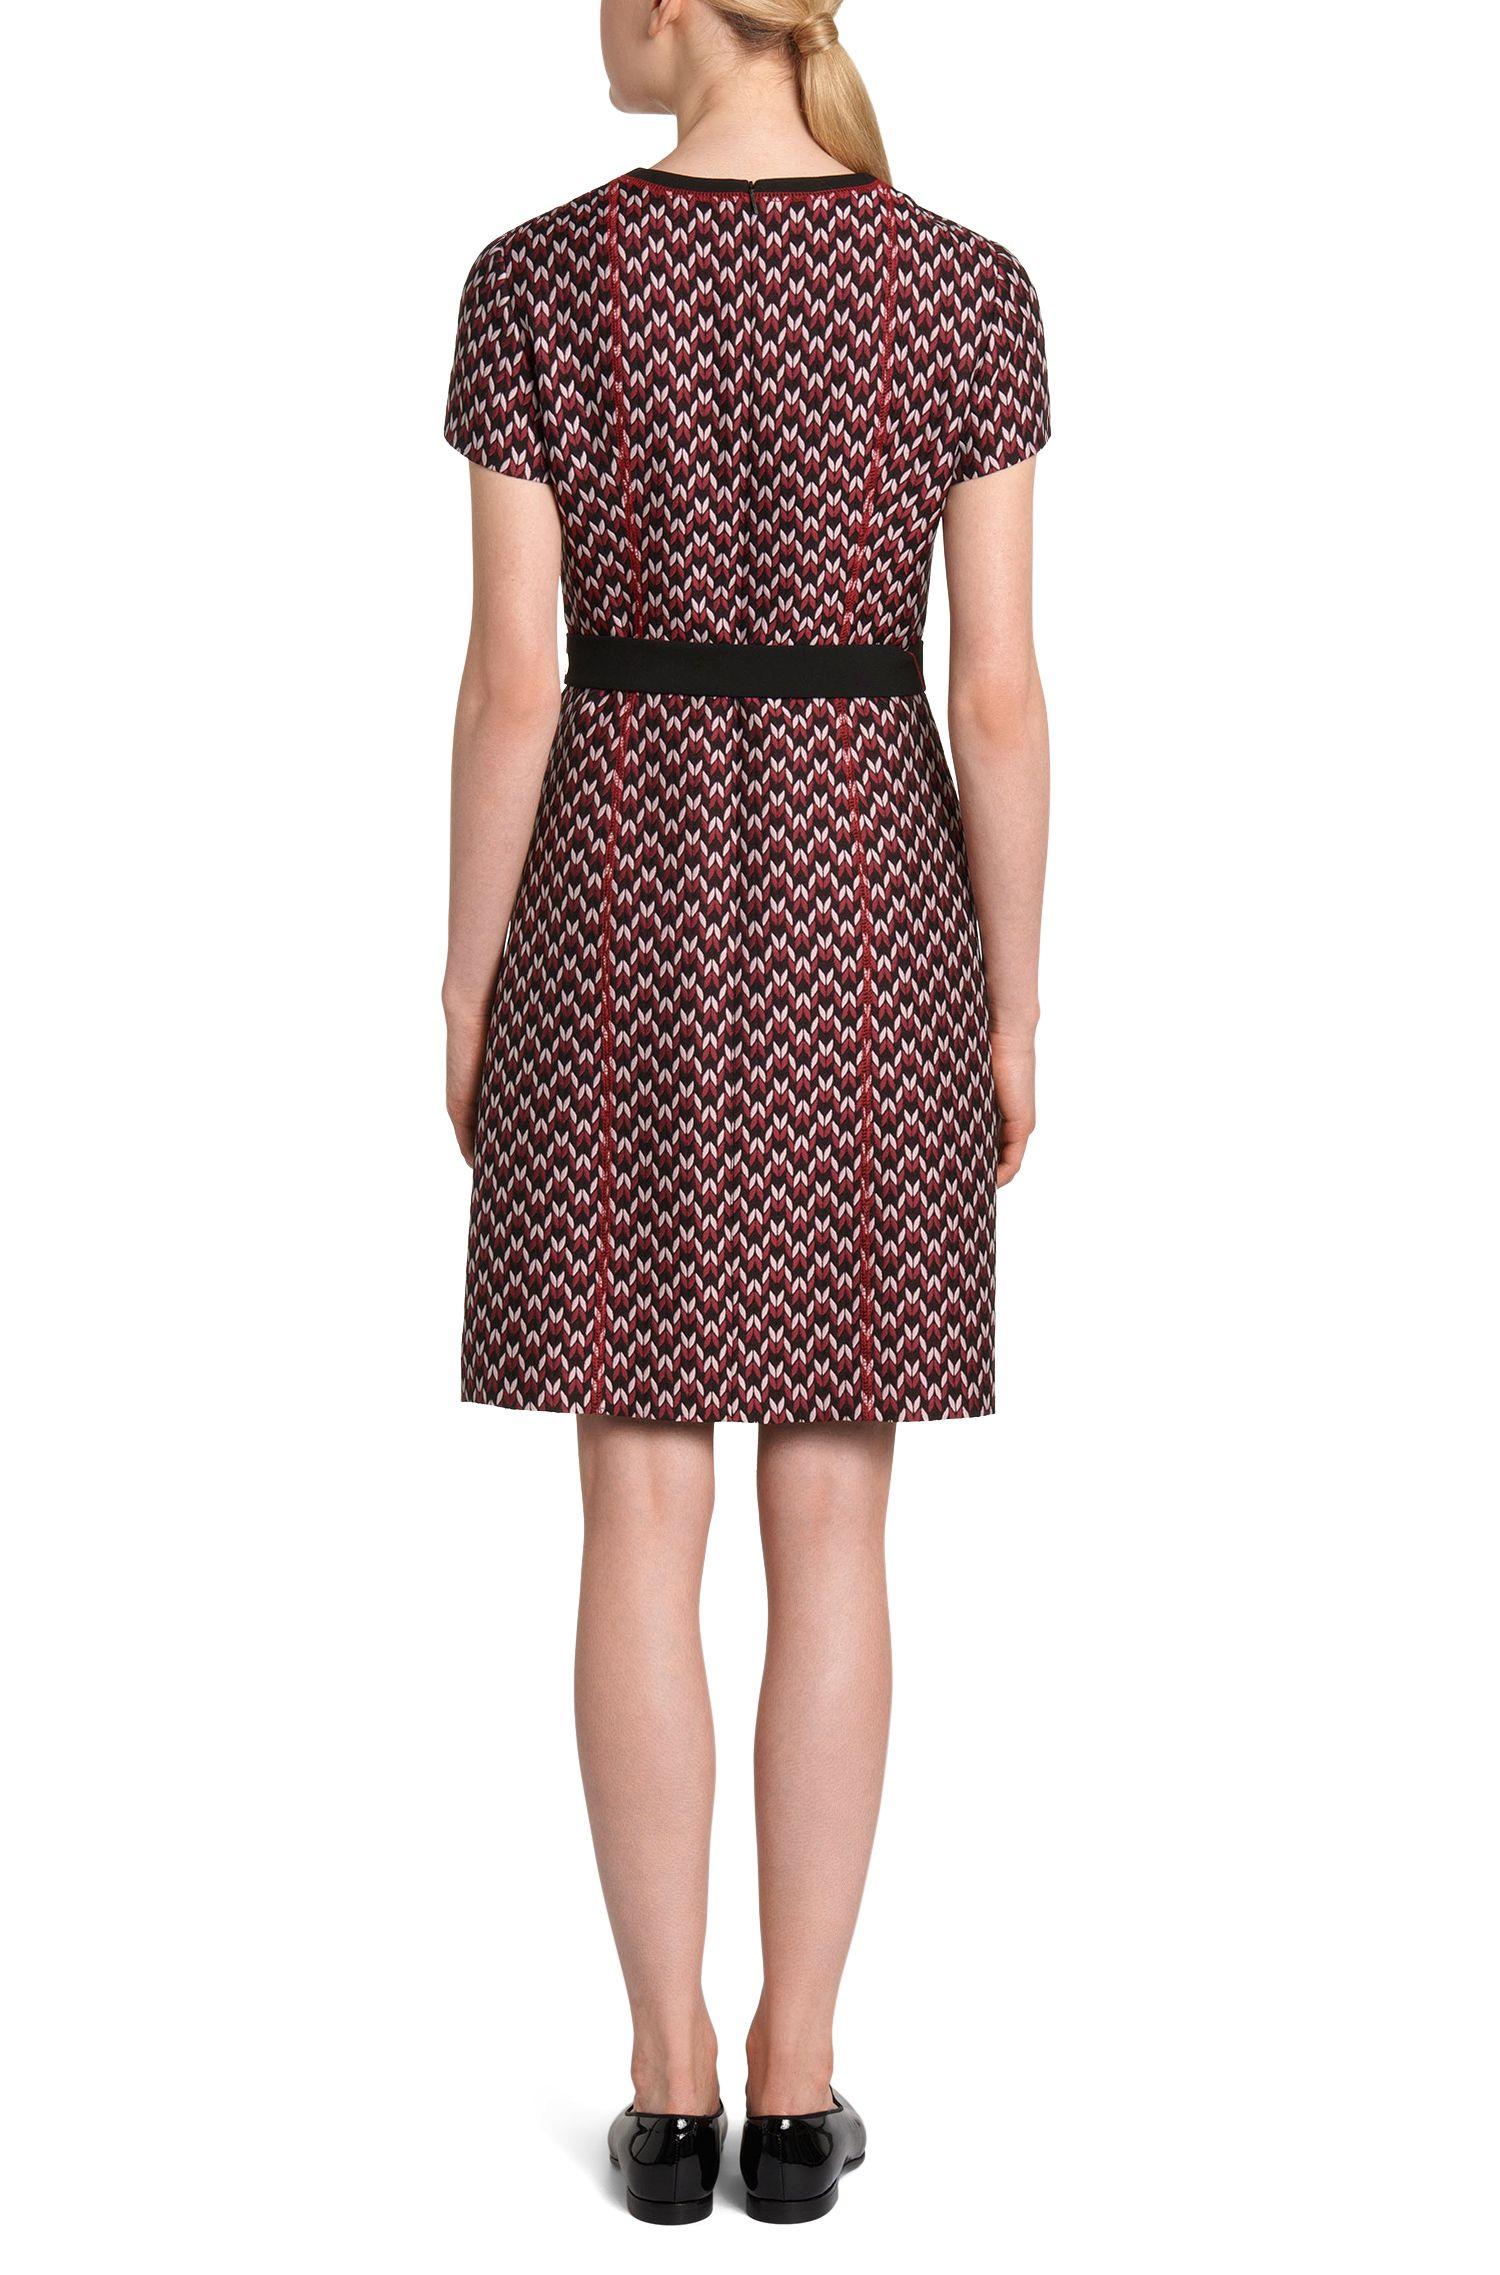 Gemustertes Kleid in Jacquard-Qualität: 'Dulana'